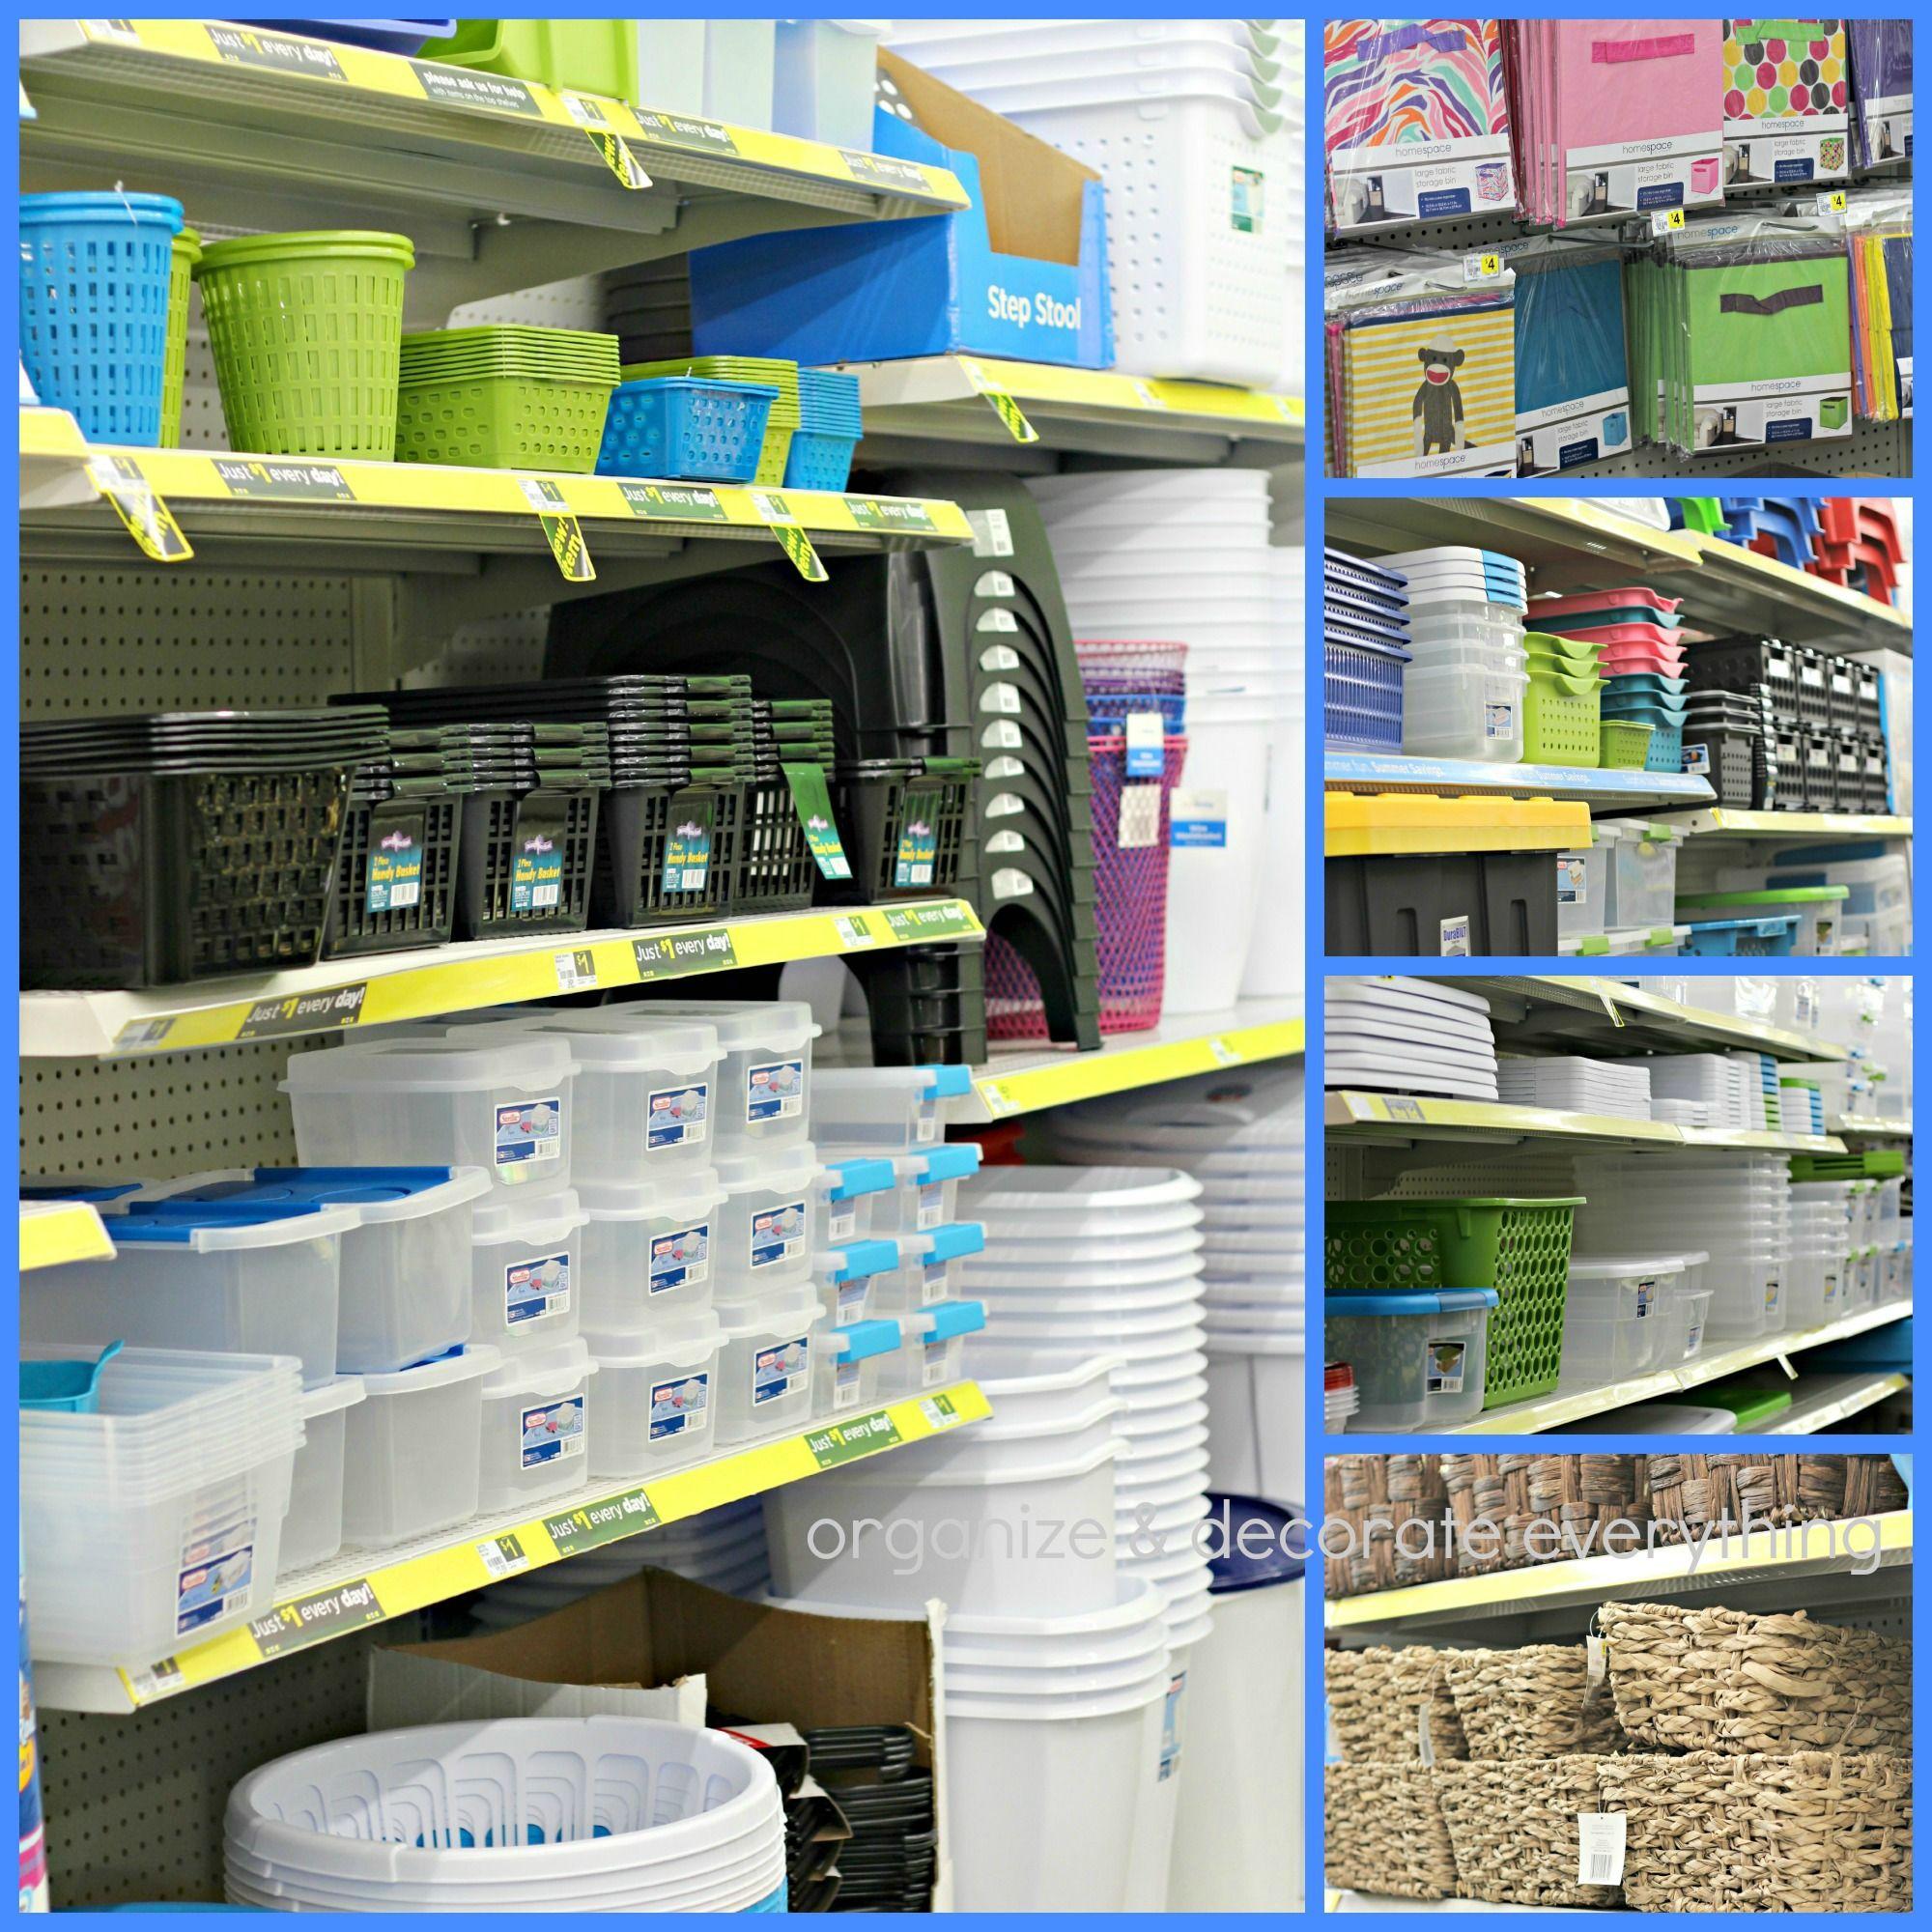 Kitchen Organization Where To Put Everything: Organize The Kitchen With Dollar General